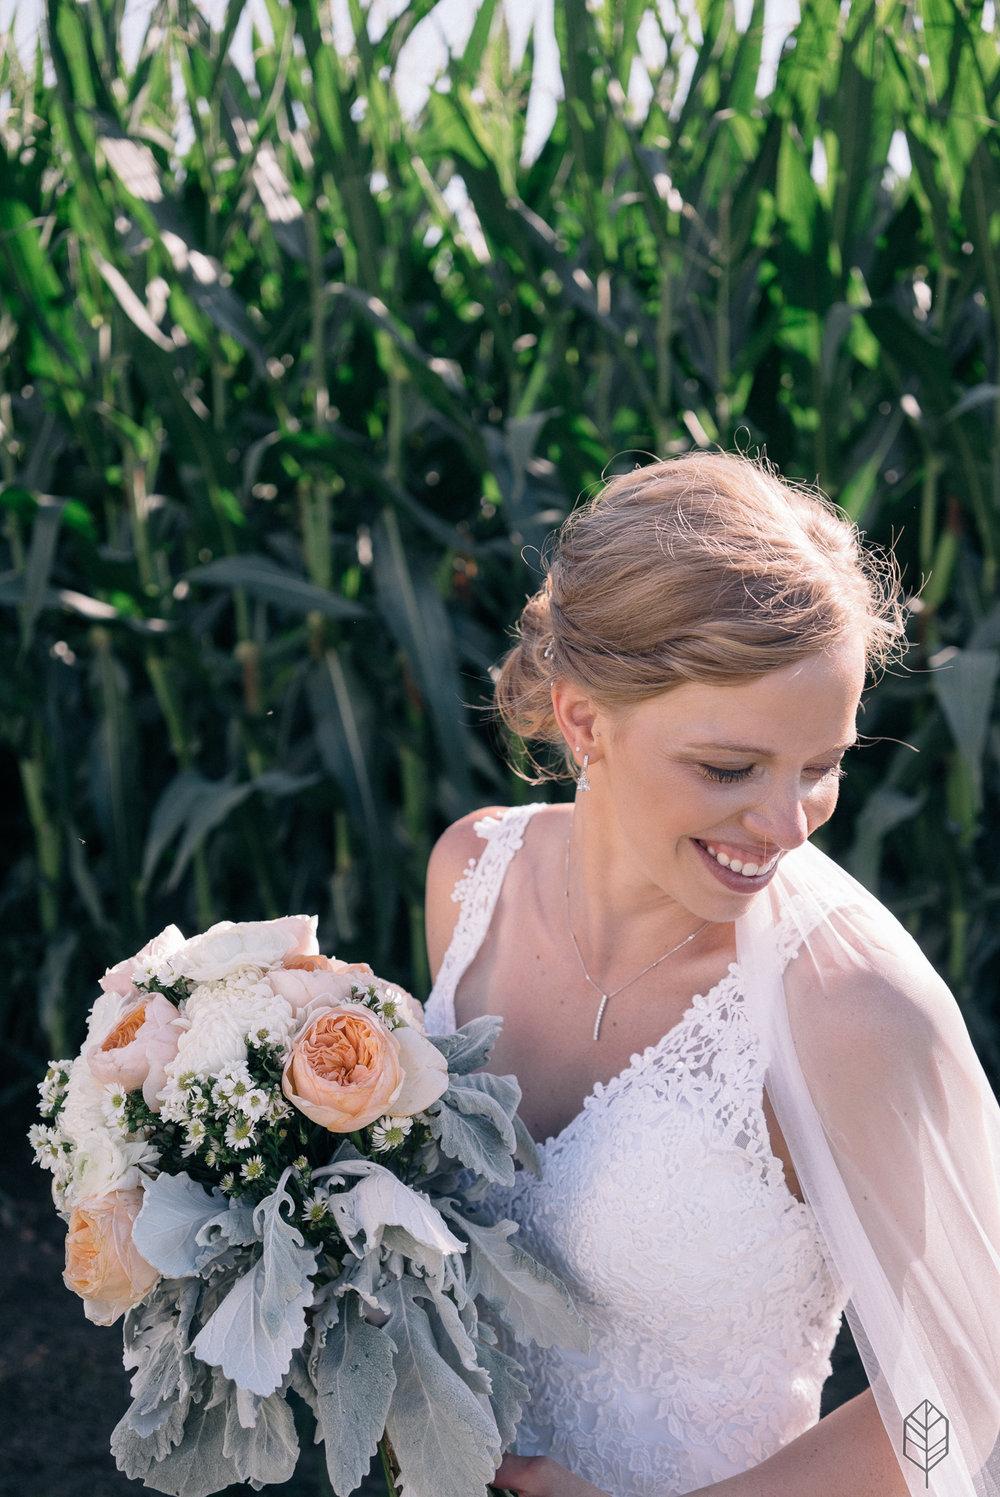 johnsonscreative_Ambrosia_wedding-38.jpg